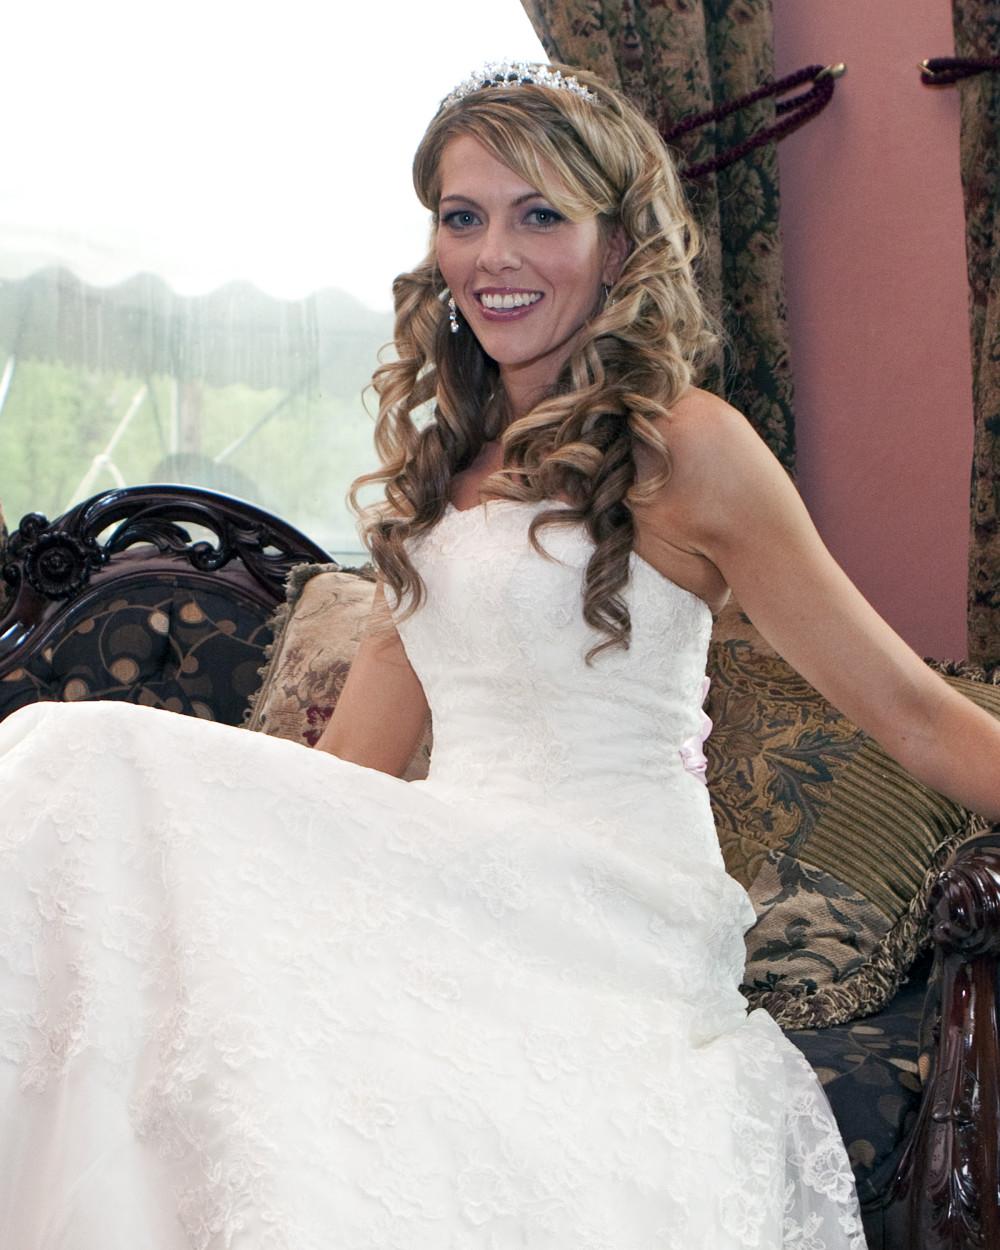 denver hair & makeup artist 1 - denver wedding photographer